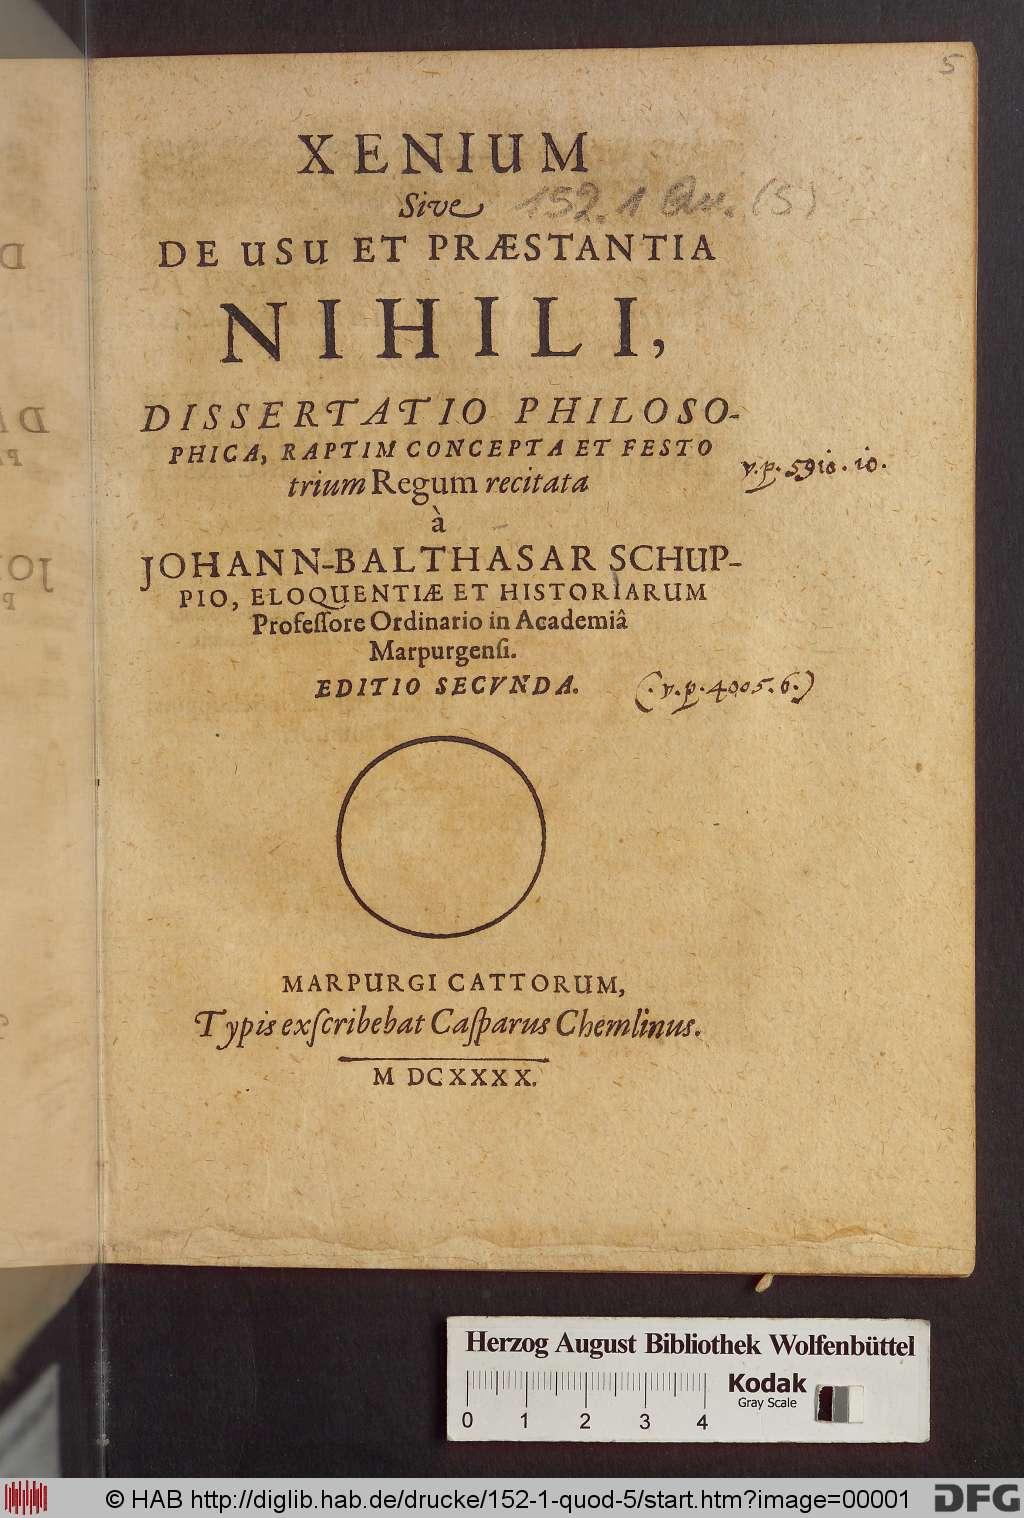 http://diglib.hab.de/drucke/152-1-quod-5/00001.jpg